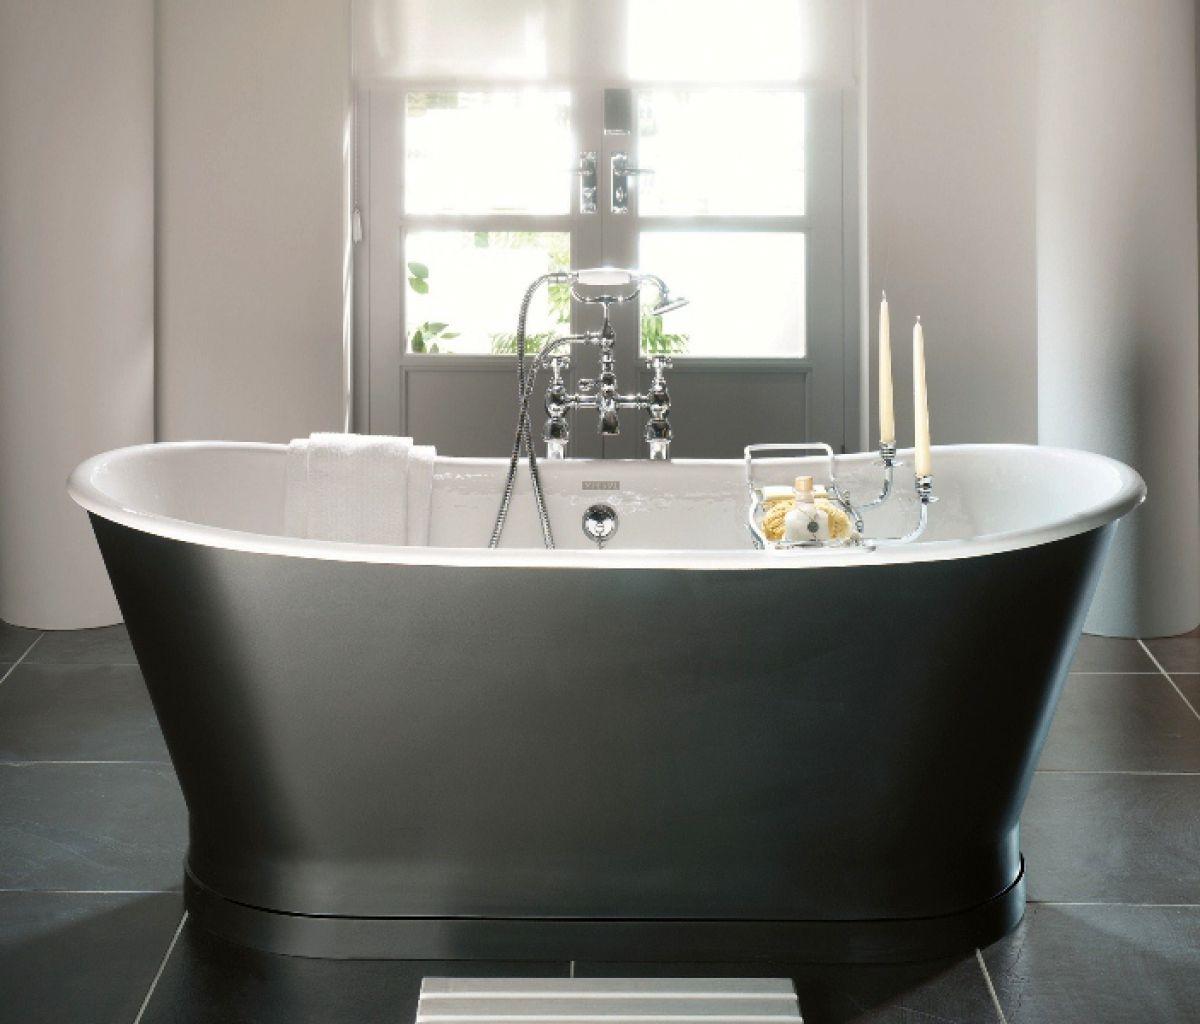 Quality cast iron baths amp steel baths at bathroom city